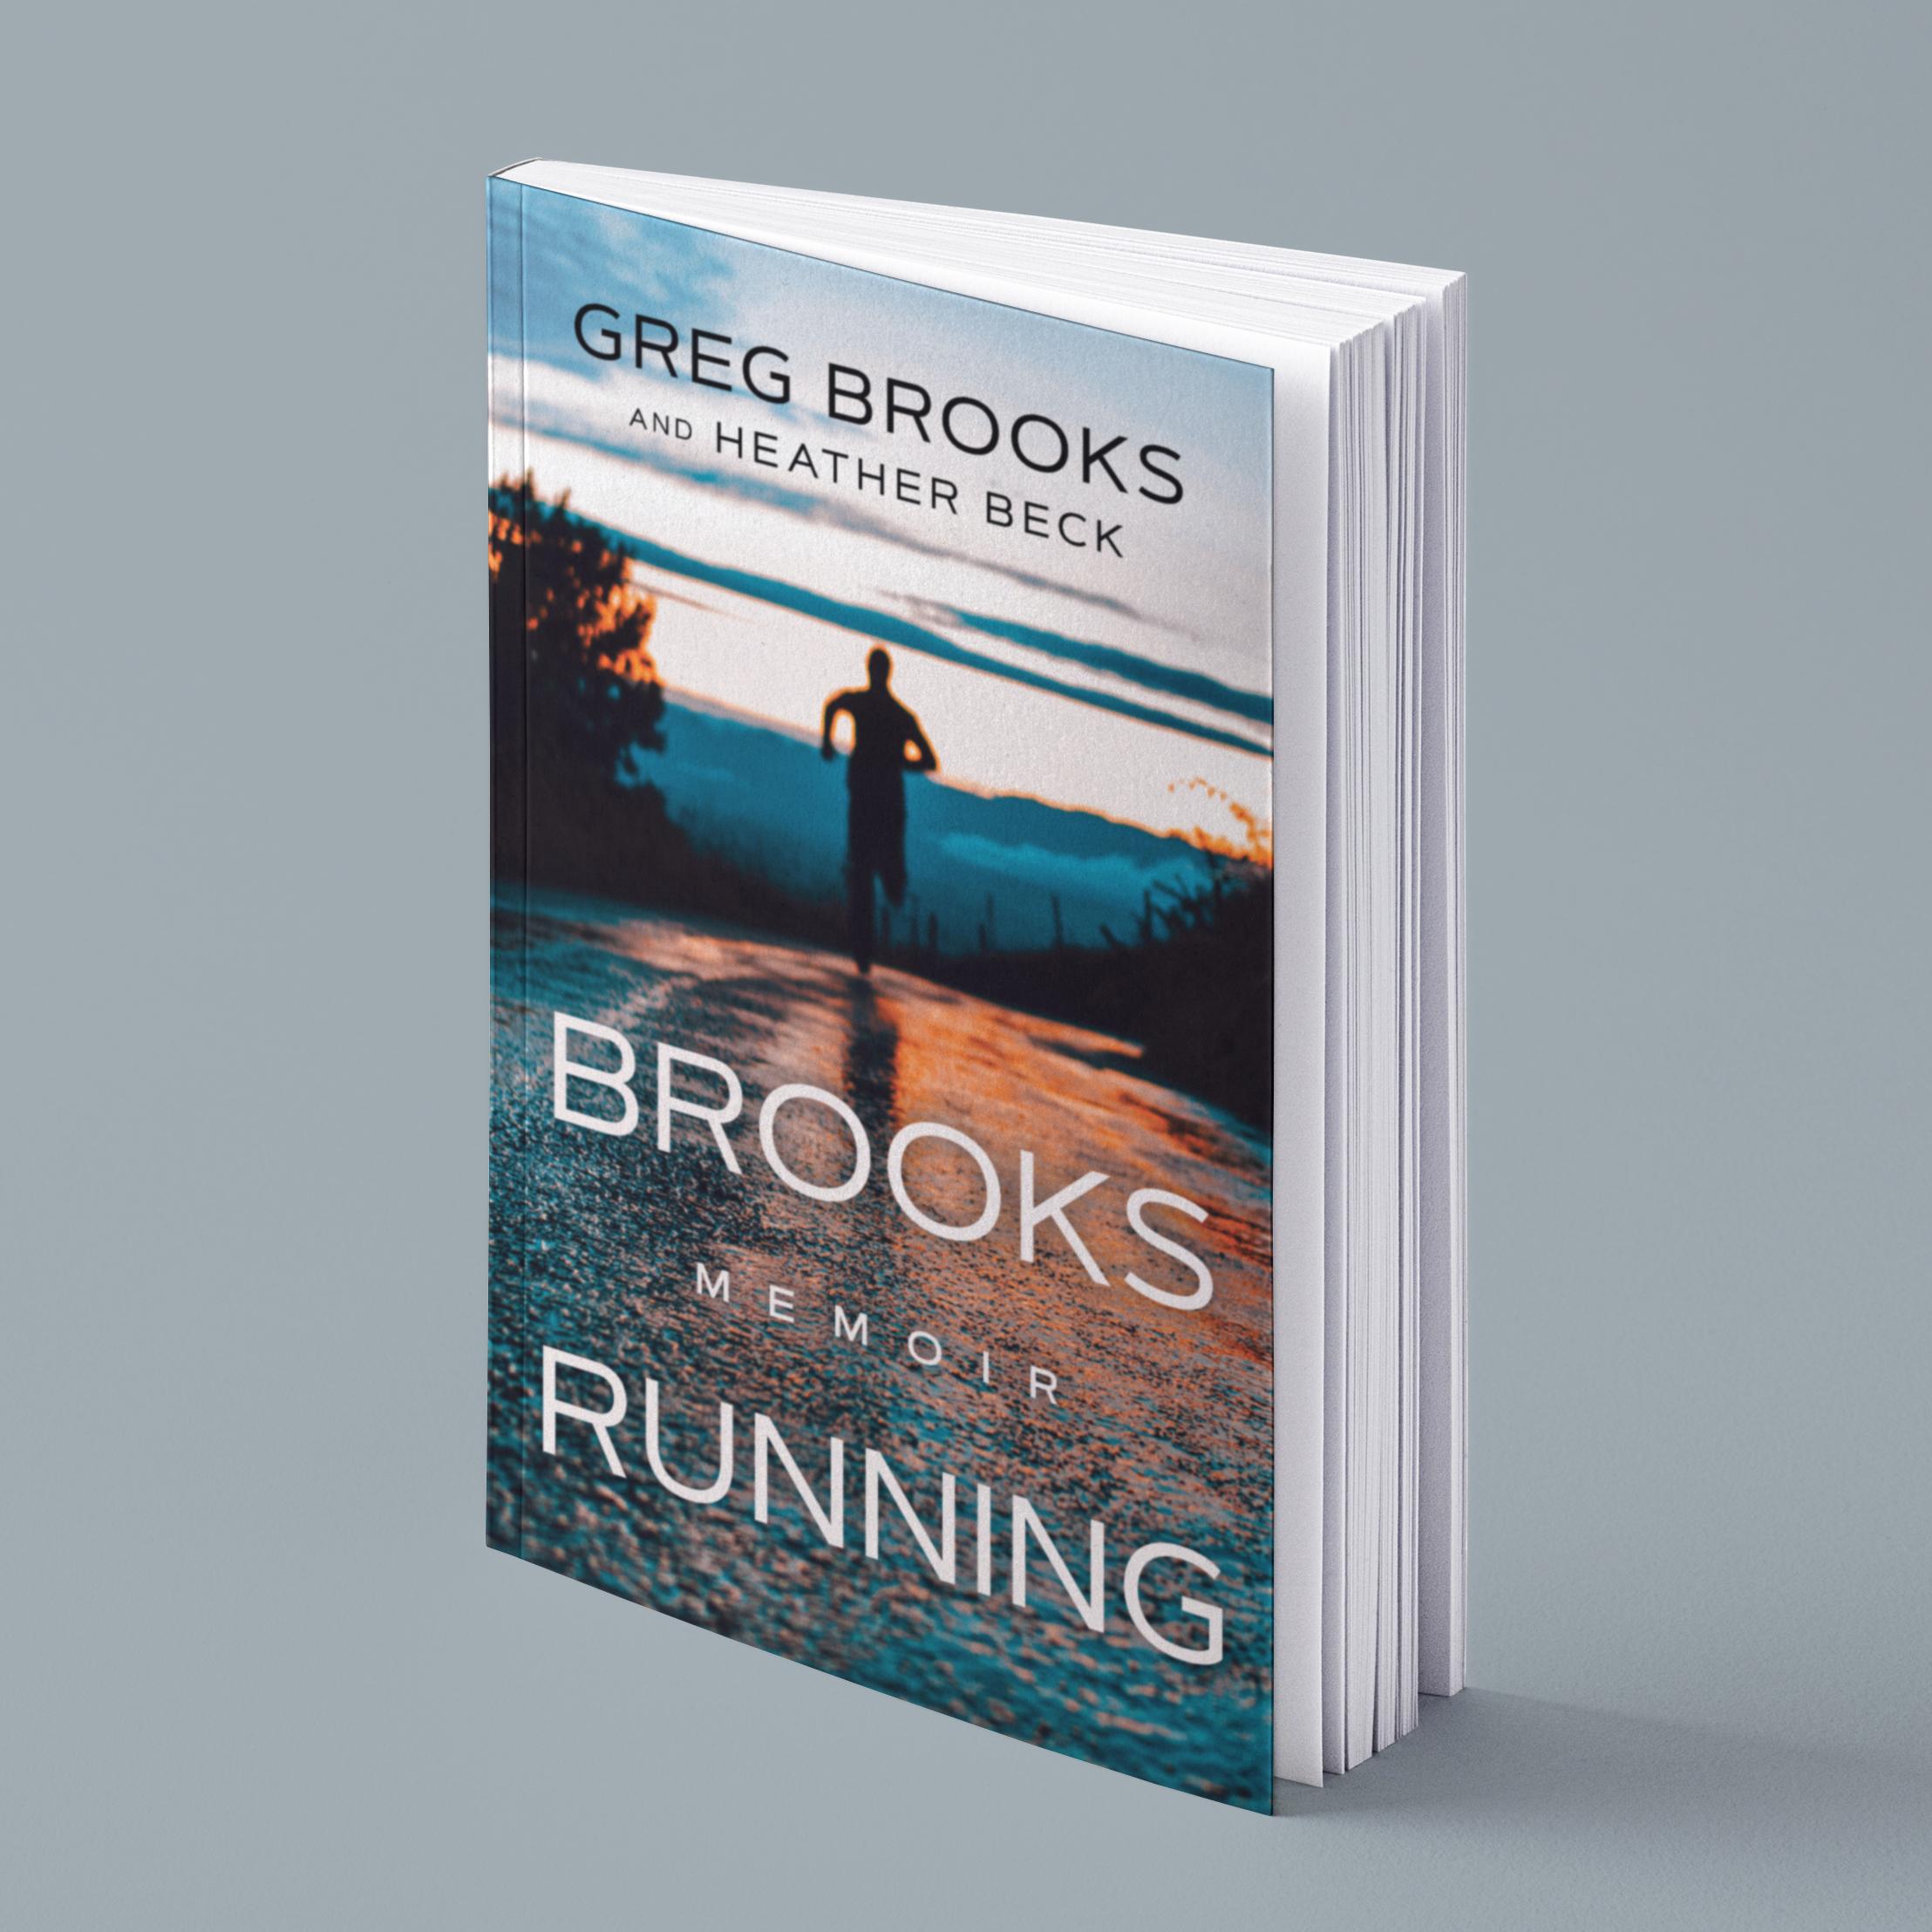 Greg Brooks, Ultramarathon Champion, Share His Full Story in New Book